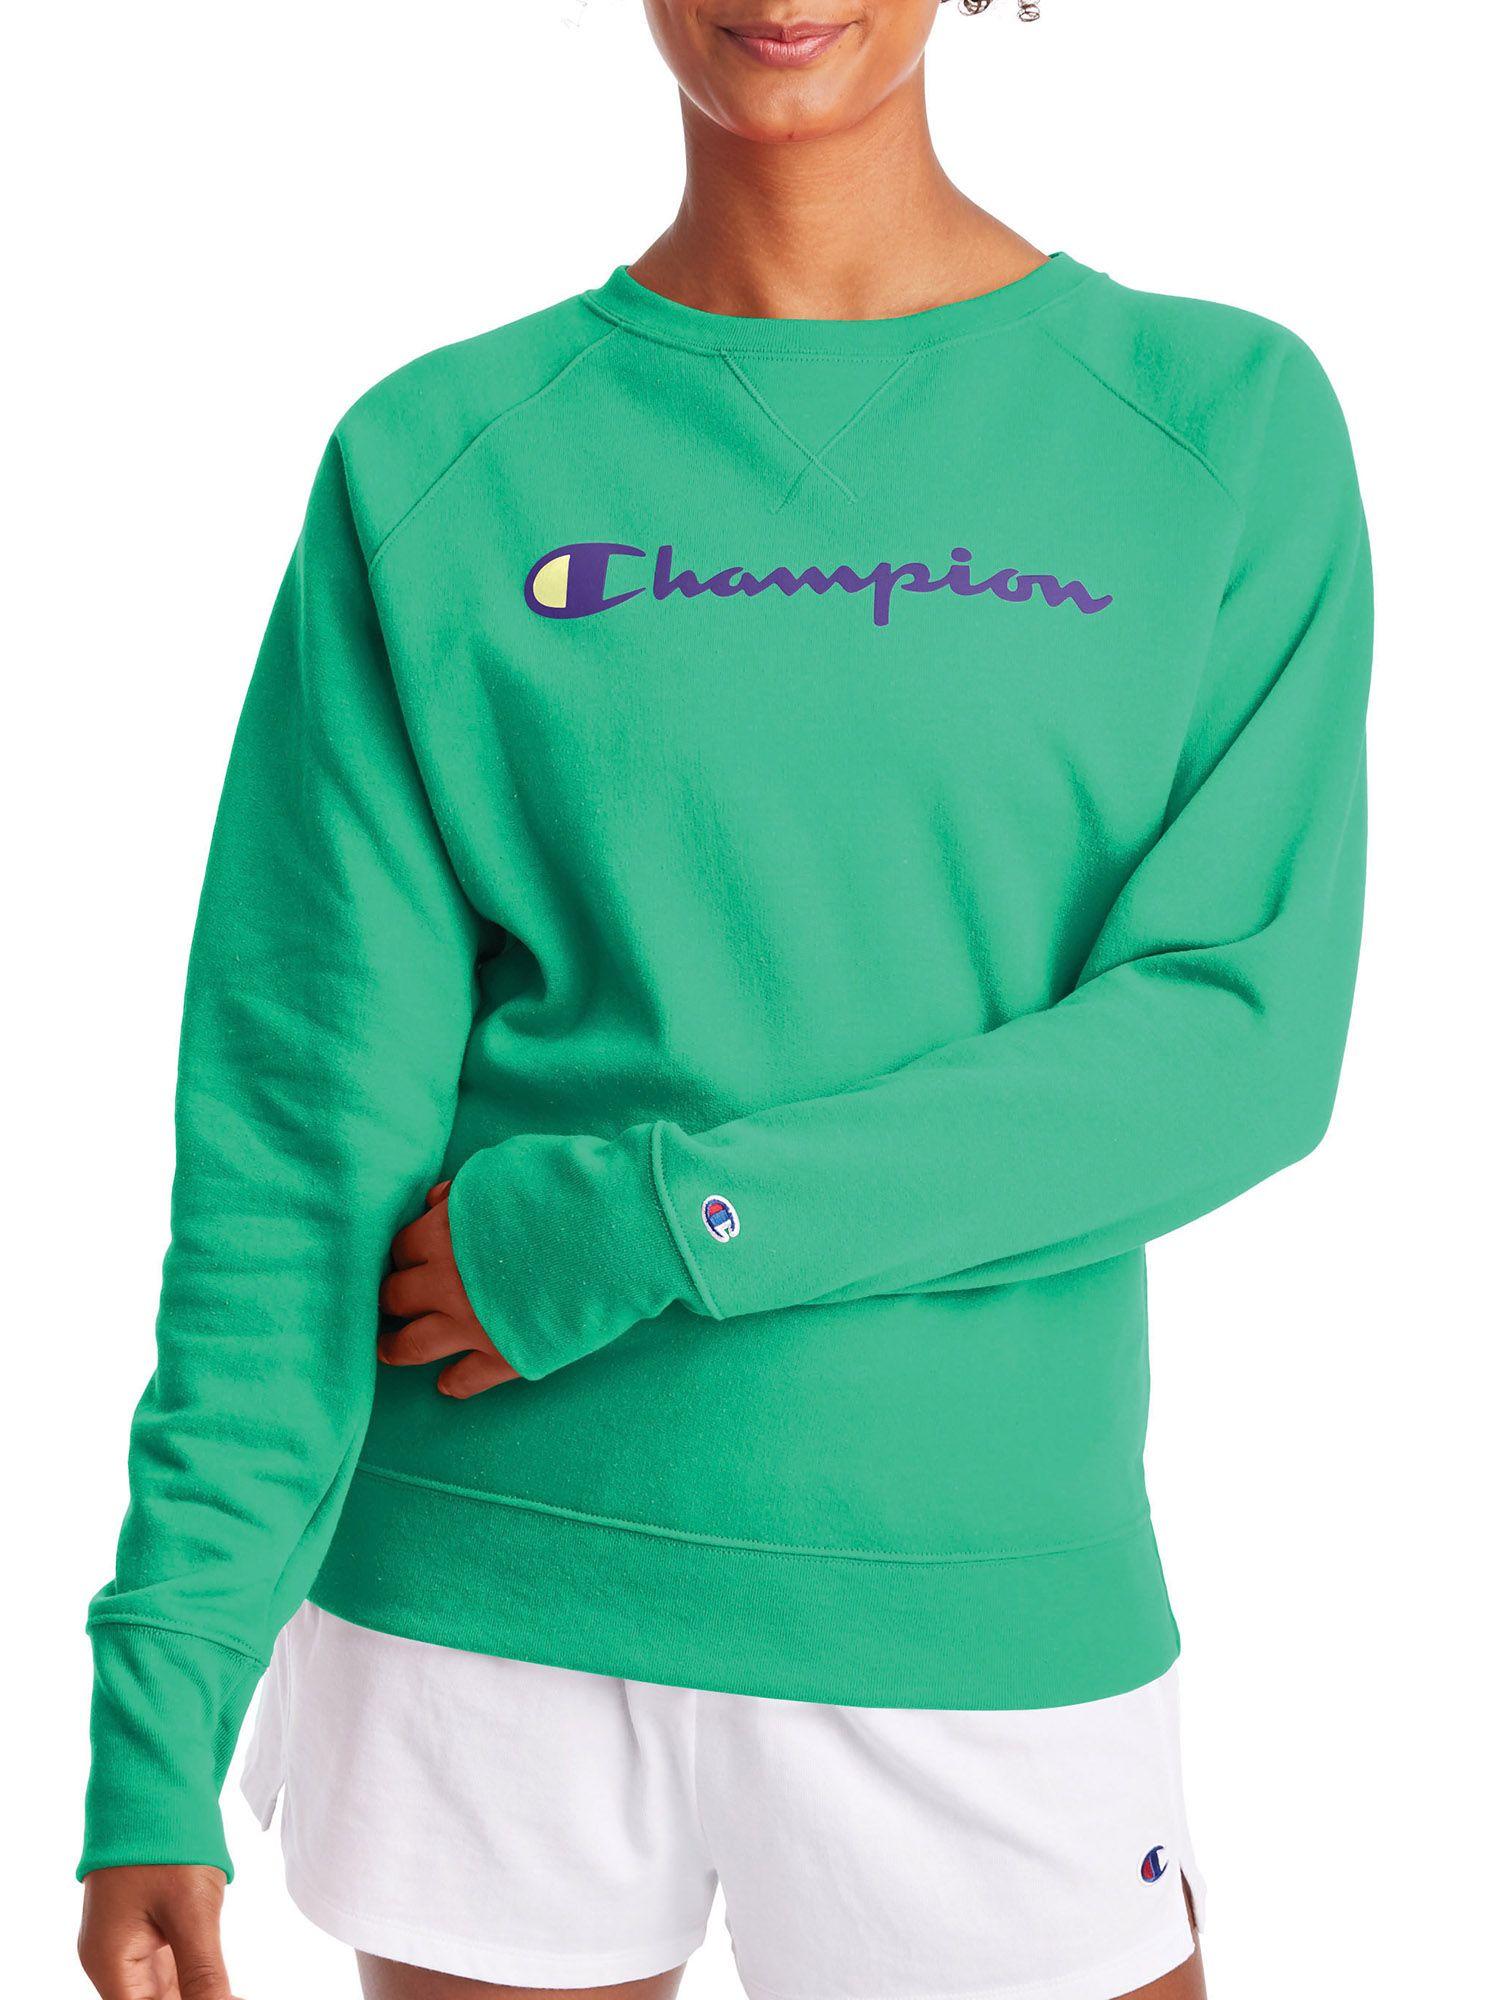 Champion Champion Women S Powerblend Graphic Fleece Boyfriend Crewneck Sweatshirt Walmart Com Sweatshirts Crew Neck Sweatshirt Champion Clothing [ 2000 x 1500 Pixel ]